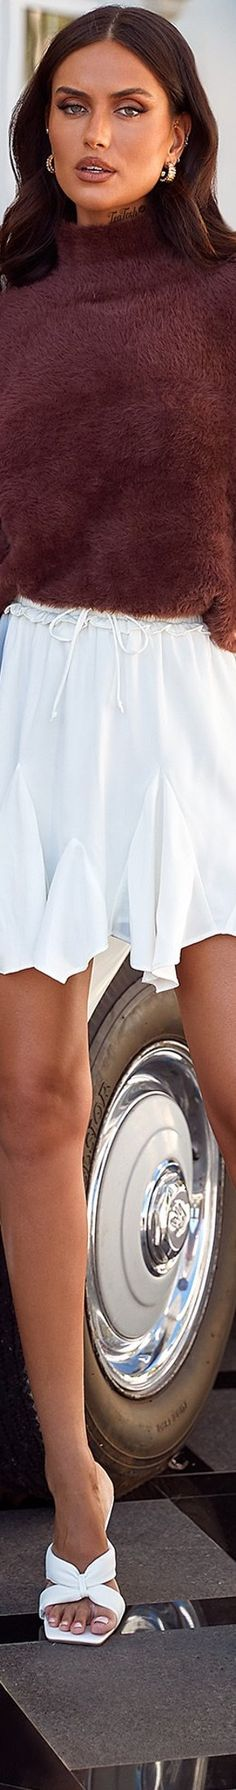 ❈Téa Tosh❈ #alamourthelabel #teatosh #taliarichman Alamour The Label, Australian Models, Living In New York, Rich Man, Chocolate Brown, White Shorts, Women, Fashion, Moda